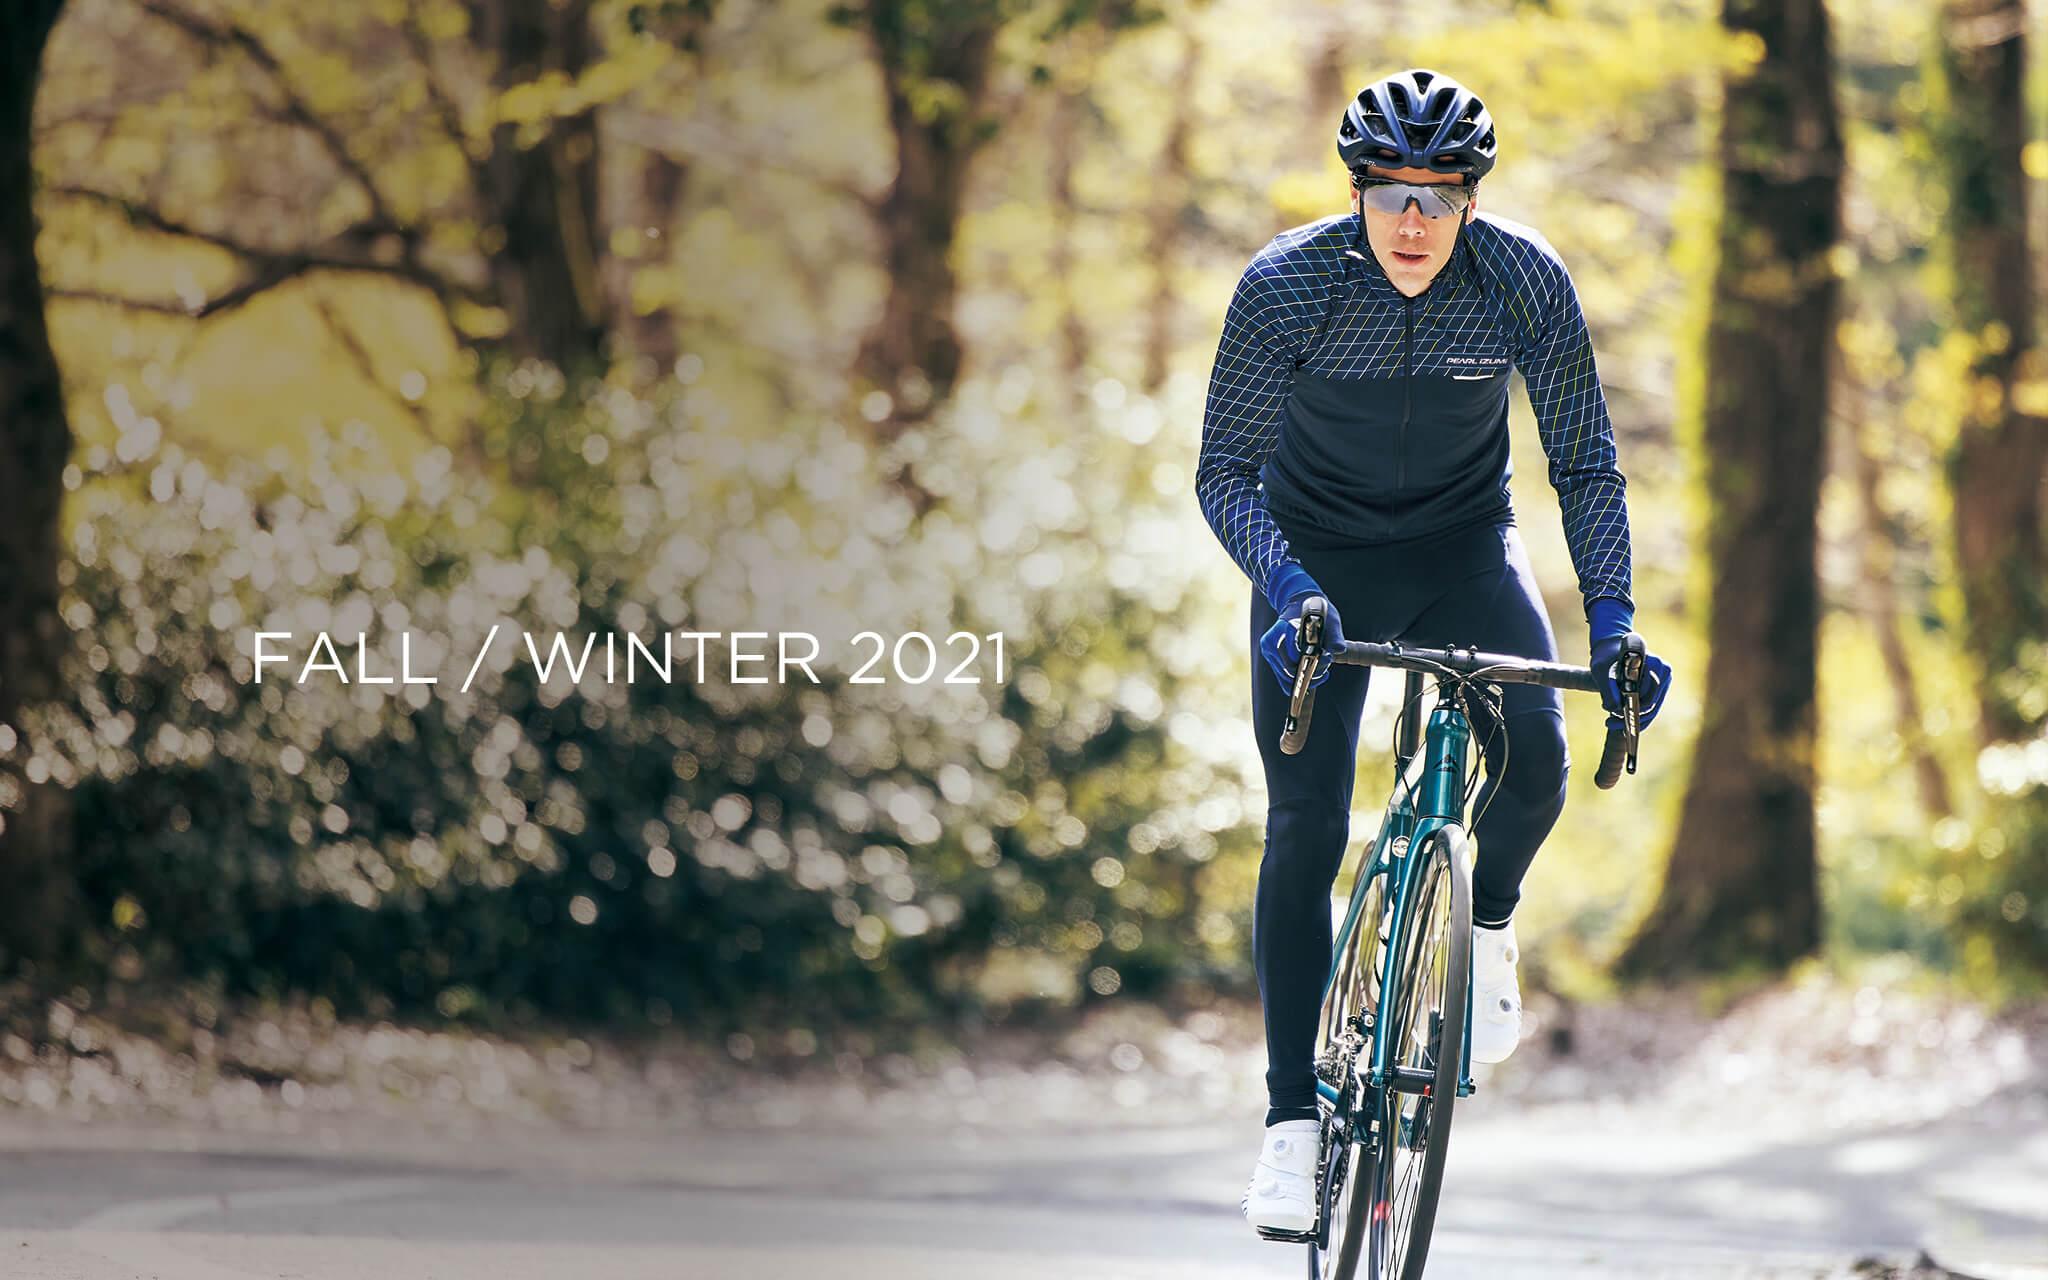 2021 FALL/WINTER